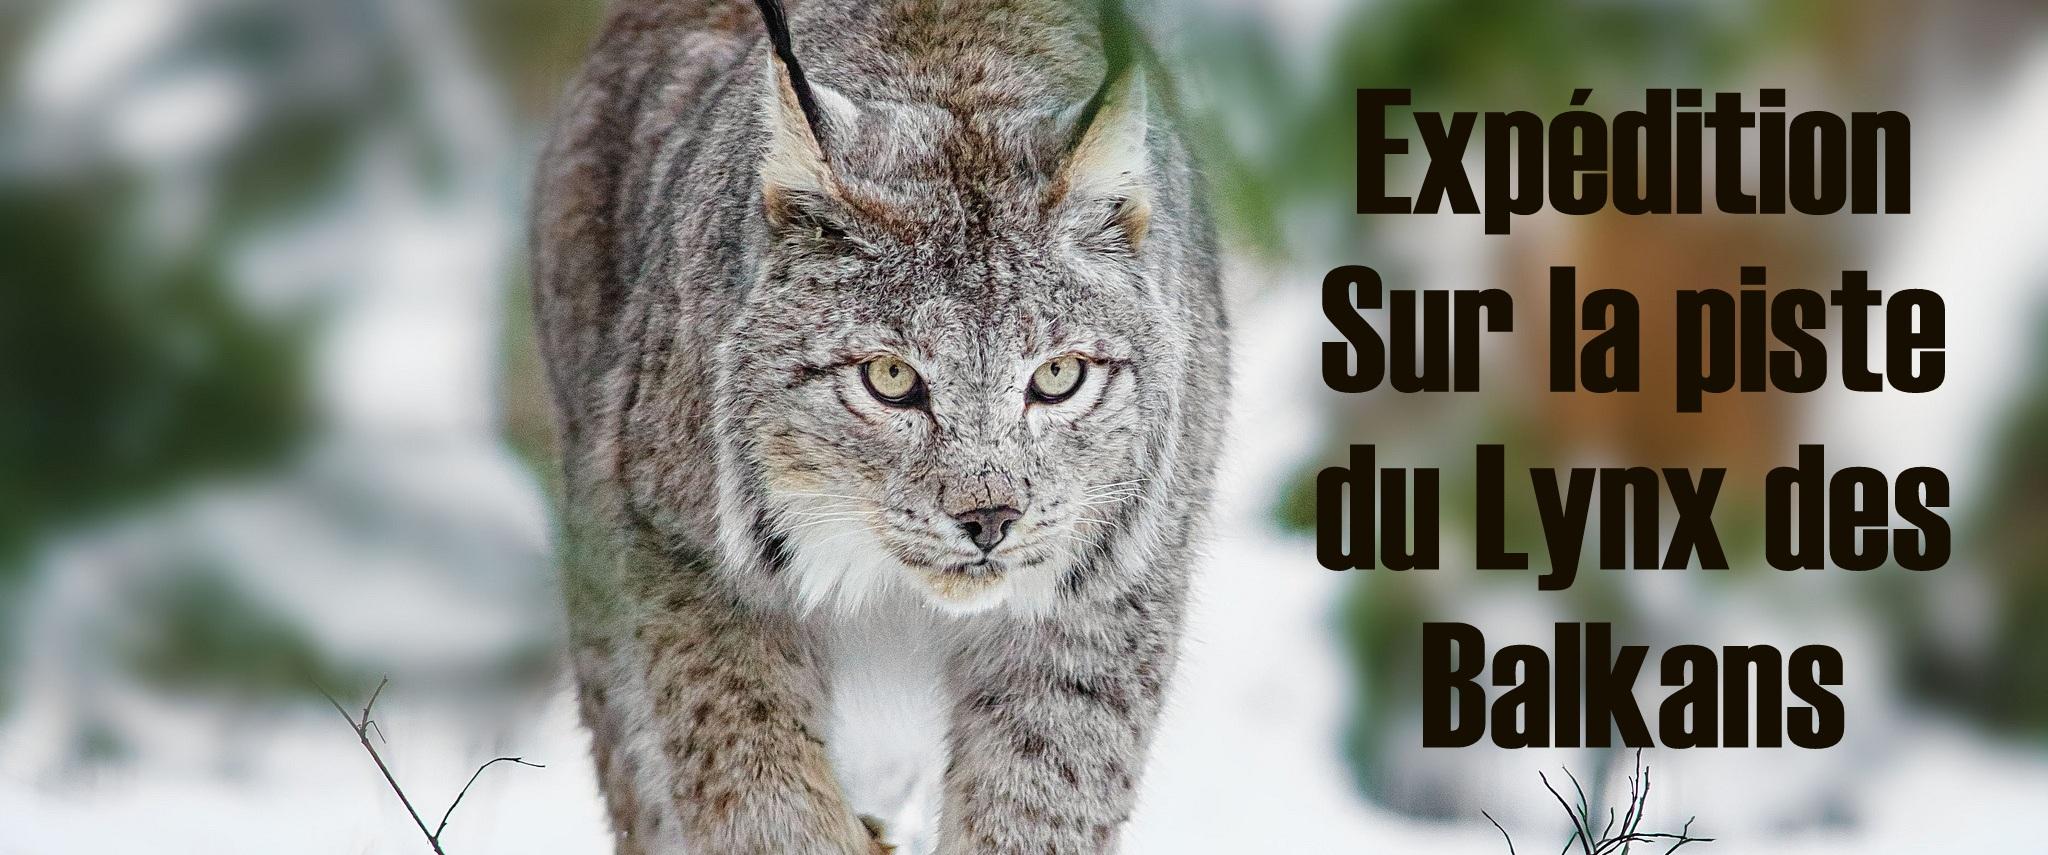 expedition lynx des balkans